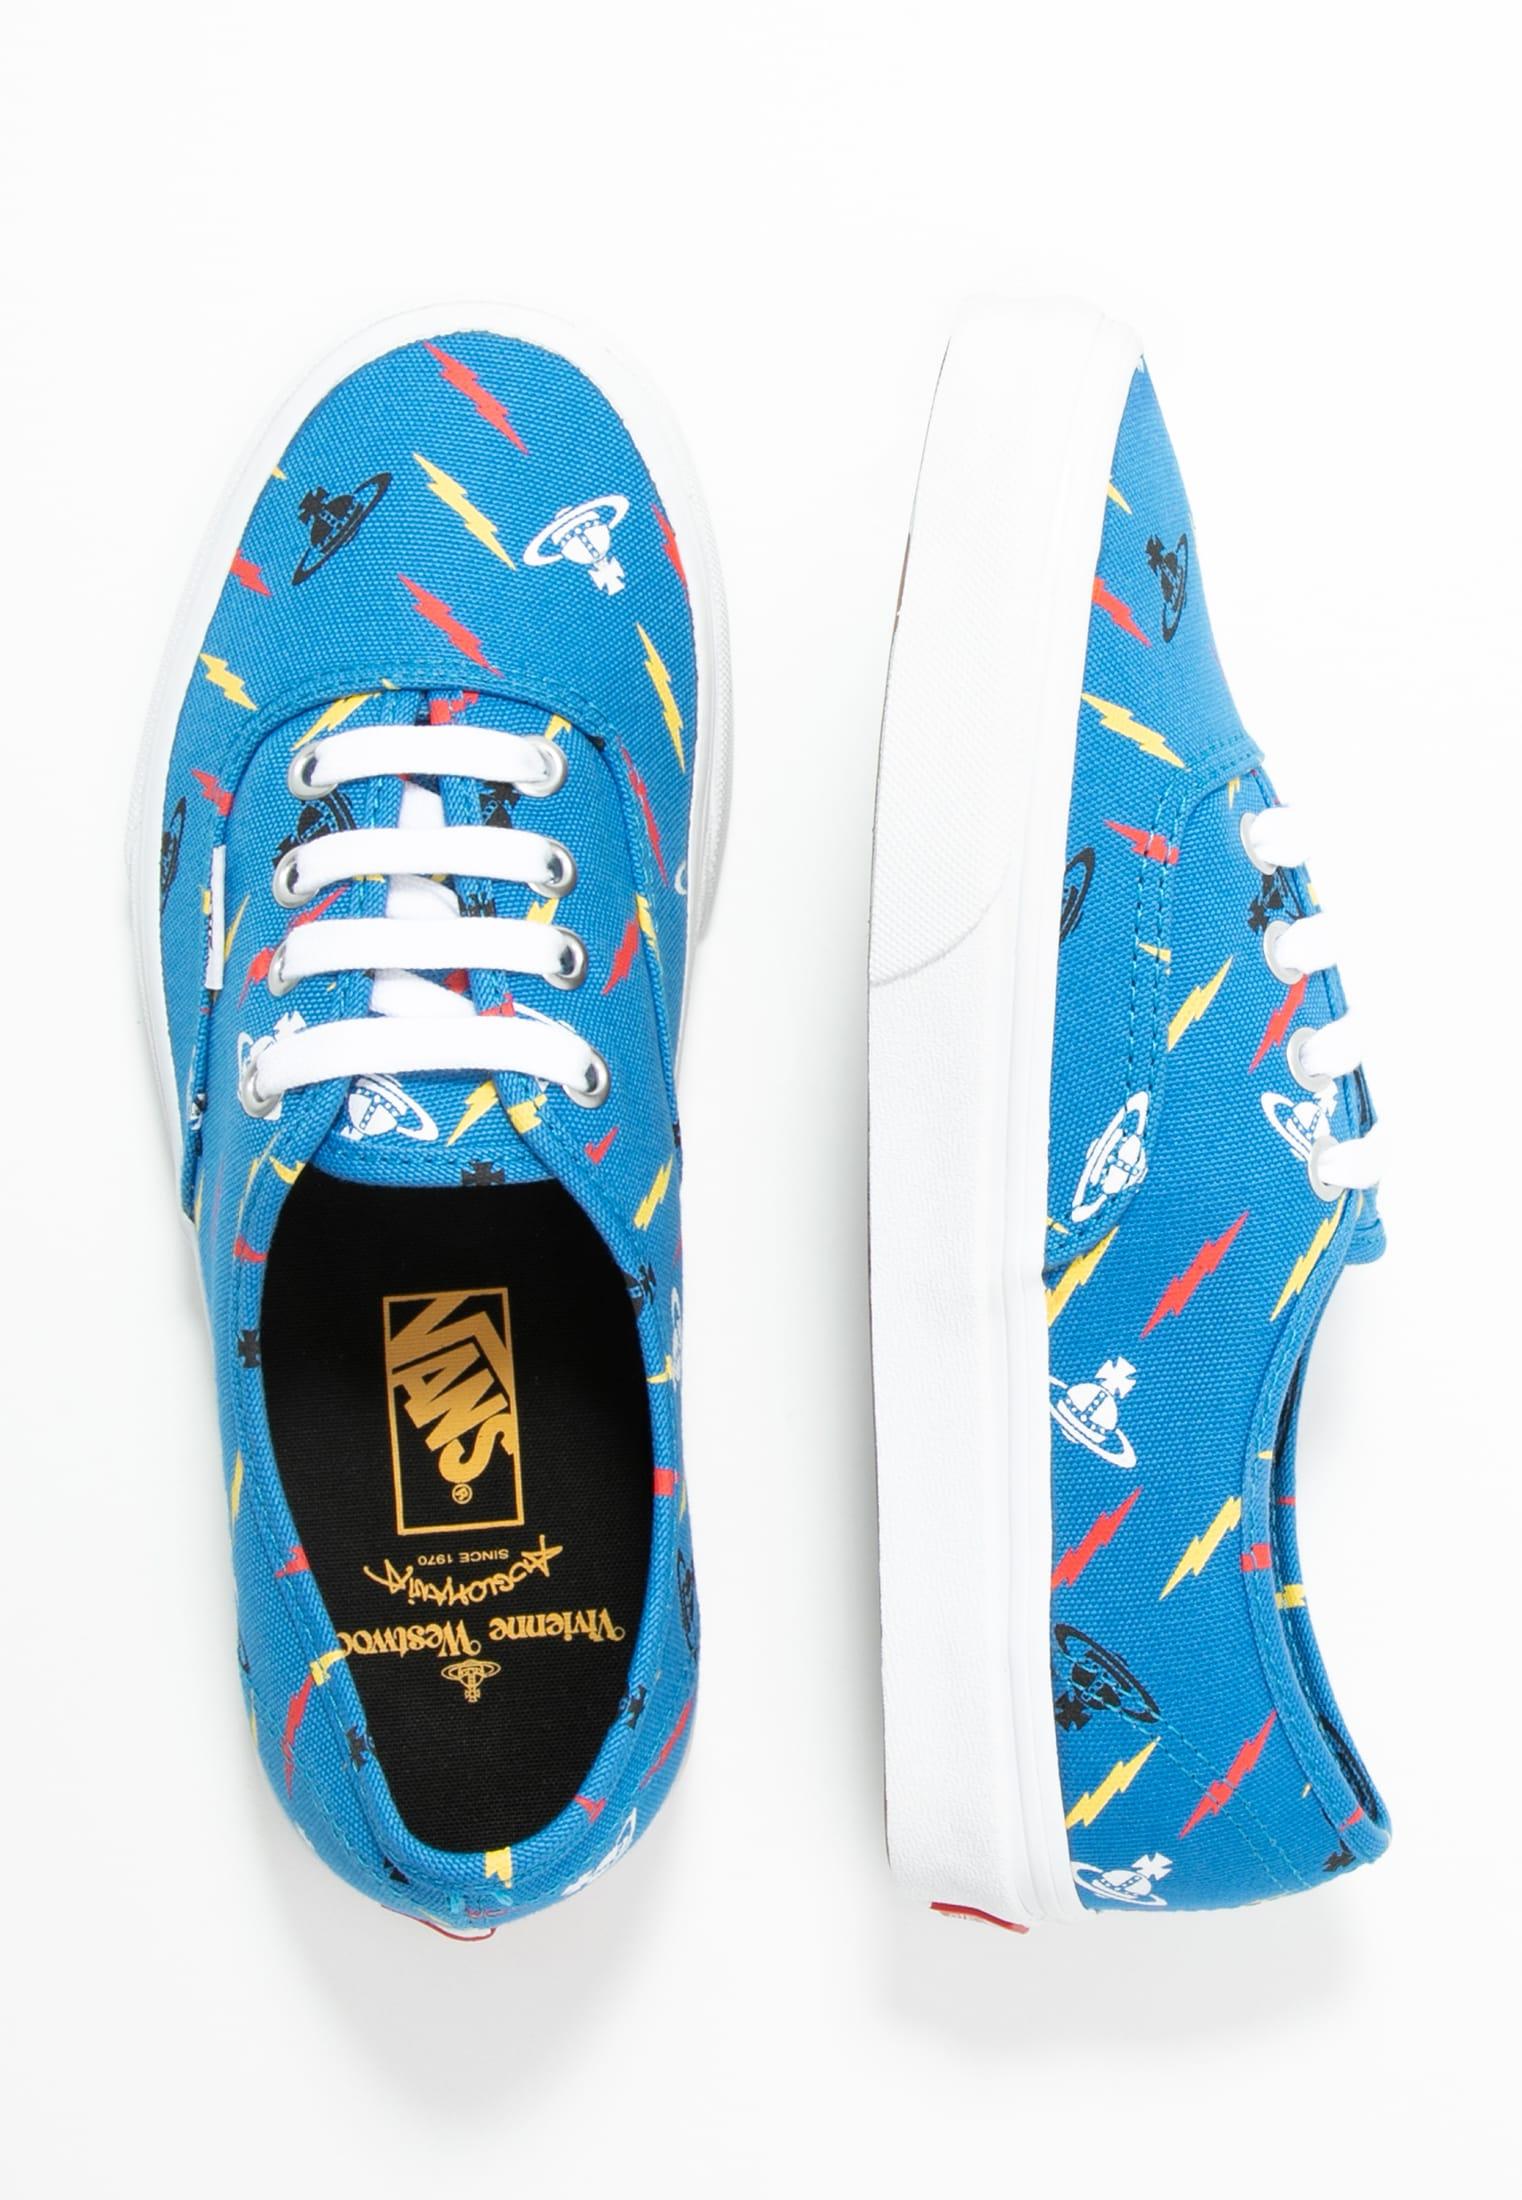 Vans Authentic X Vivienne Westwood sneakers @ Zalando